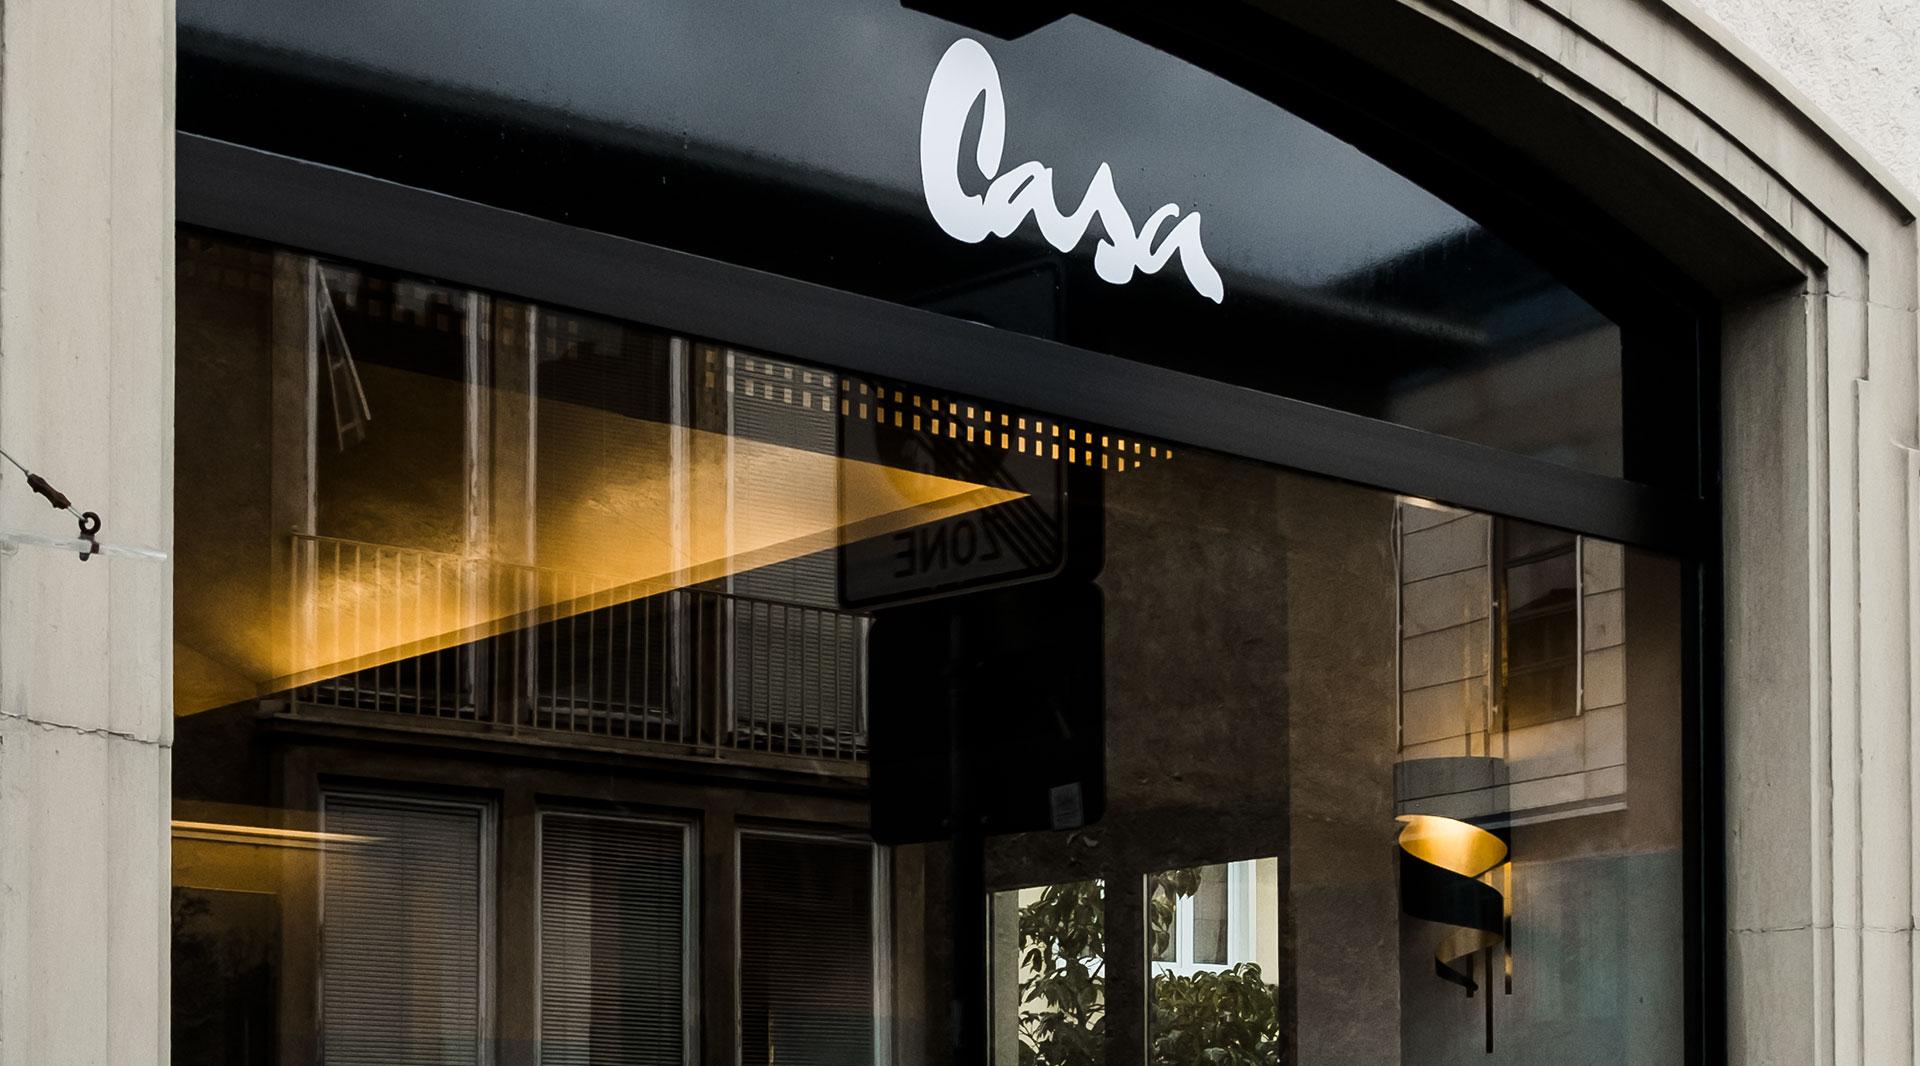 Cafe Casa Markenkreation Logo jo's Büro für Gestaltung Designbüro Würzburg